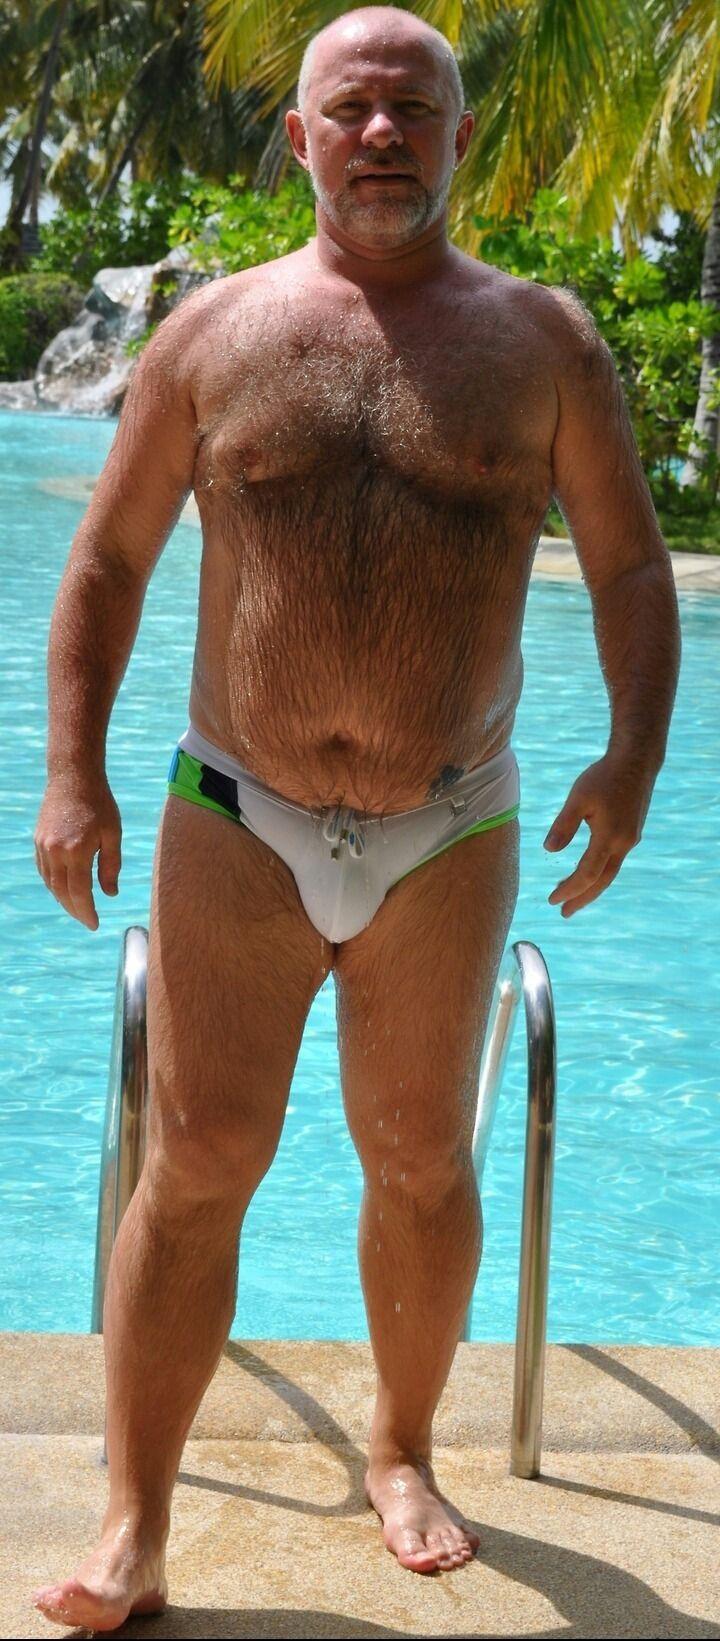 Naked Hairy Grandpa Cool 724 best cool grandpa images on pinterest | bear, bear men and bears